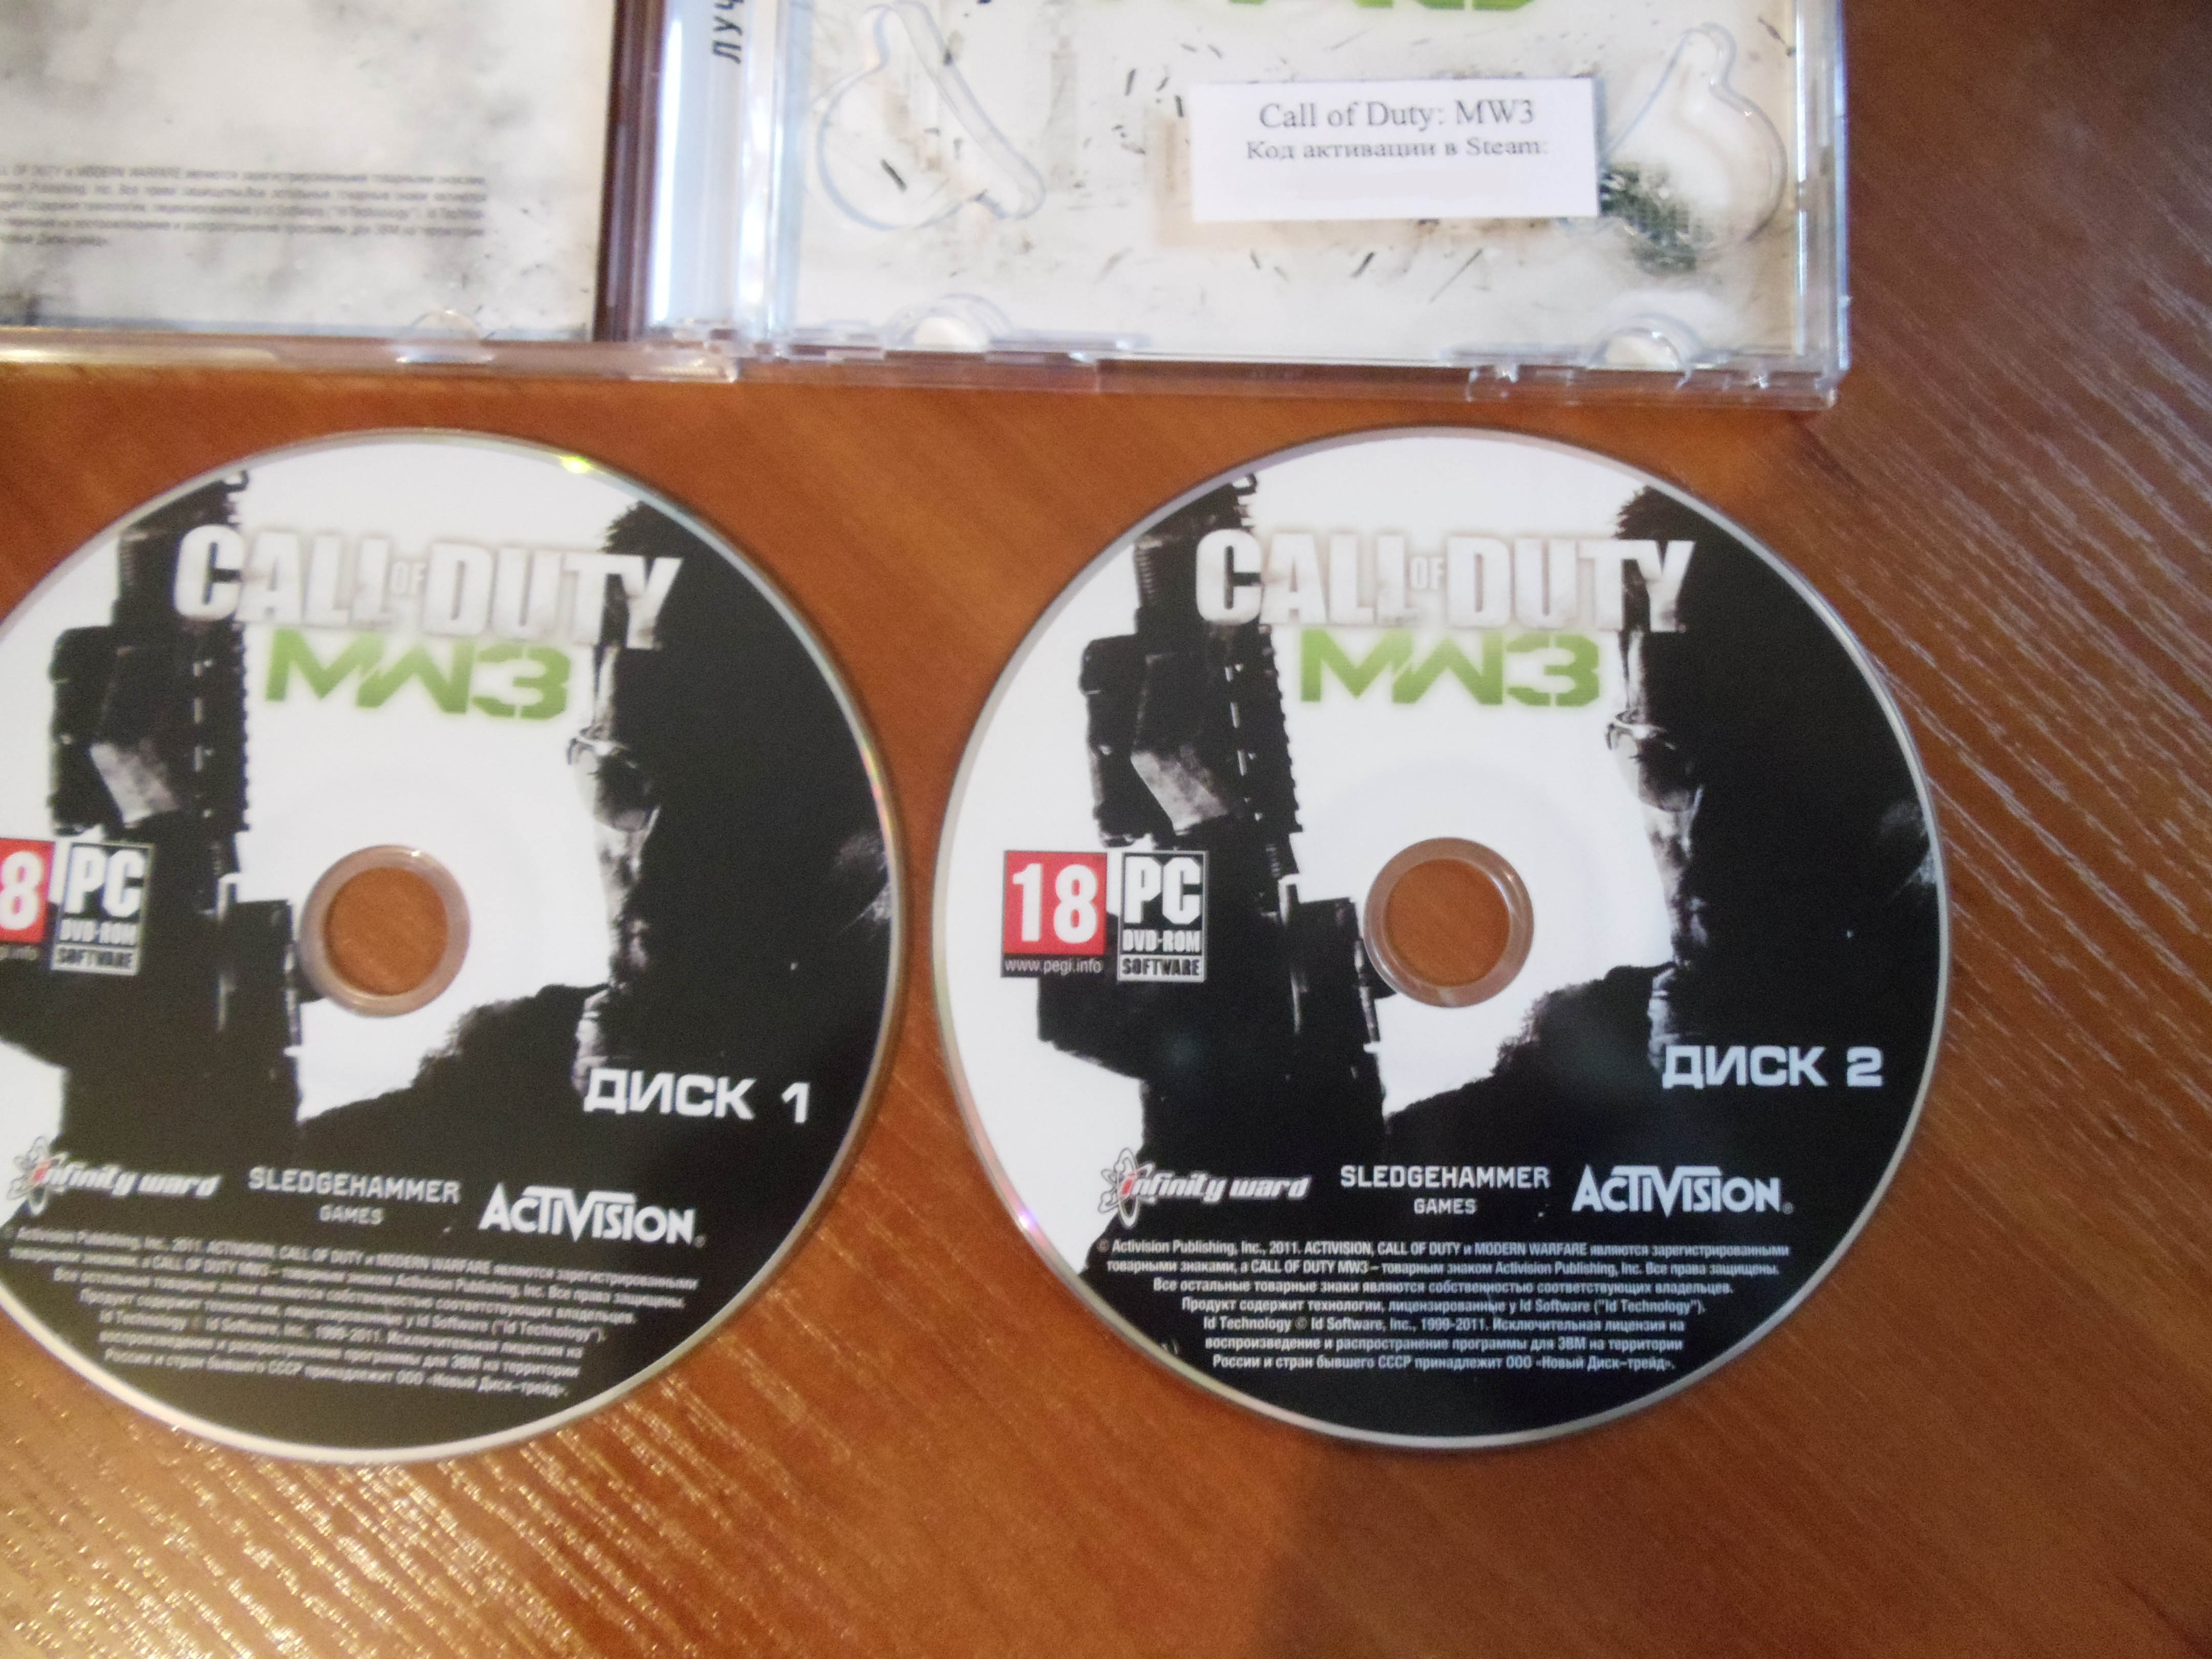 Статьи по Call of Duty Modern Warfare 3, Call of Duty Modern Warfare 2